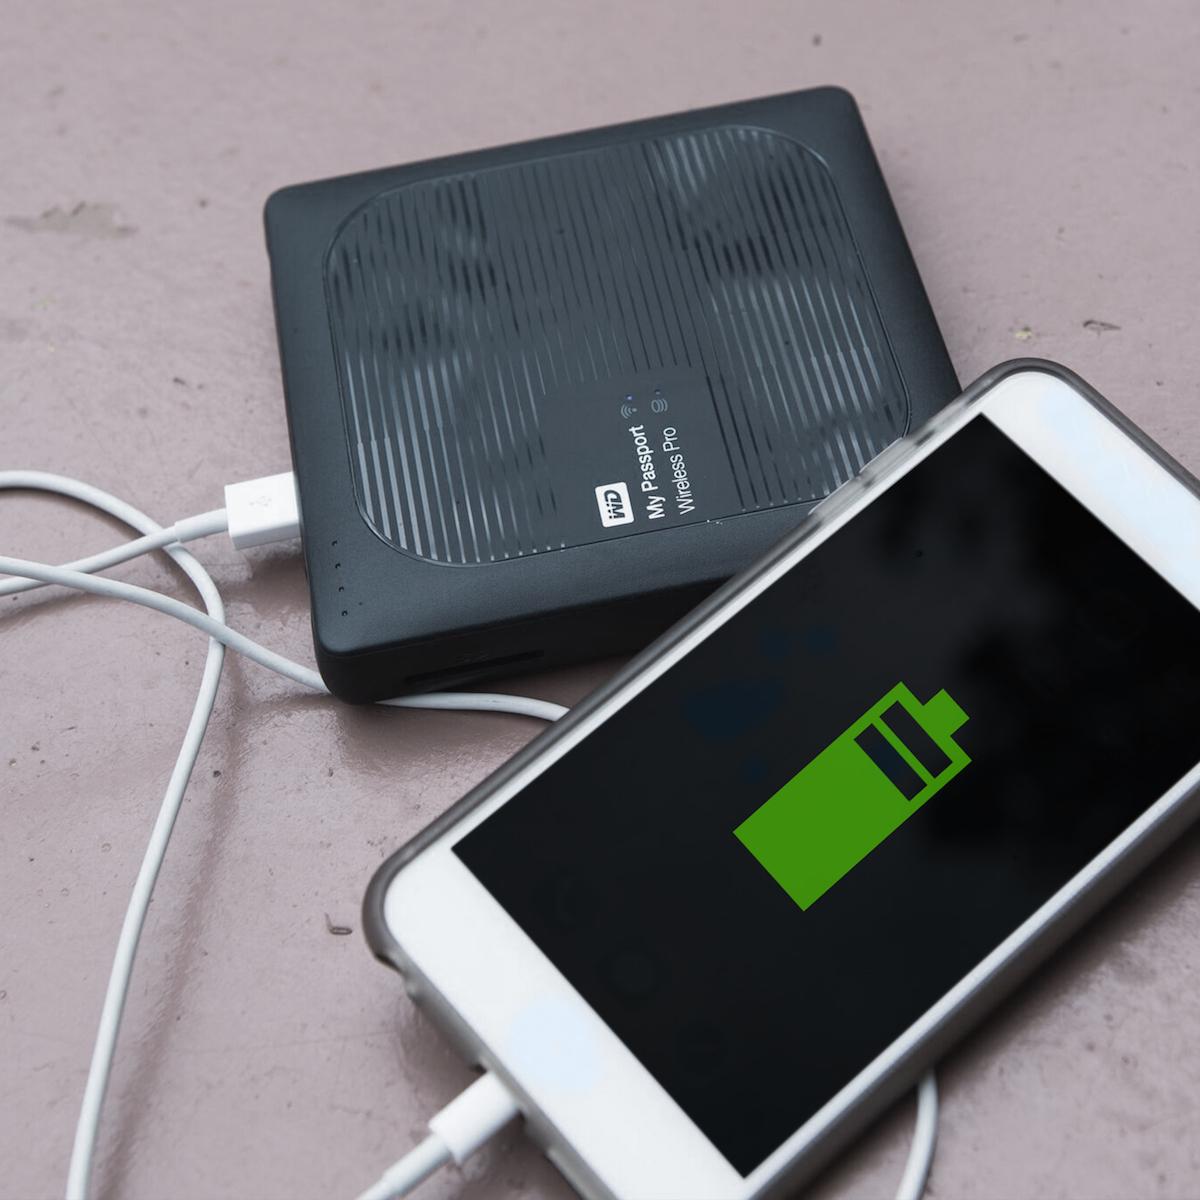 estern Digital My Passport Wireless Pro